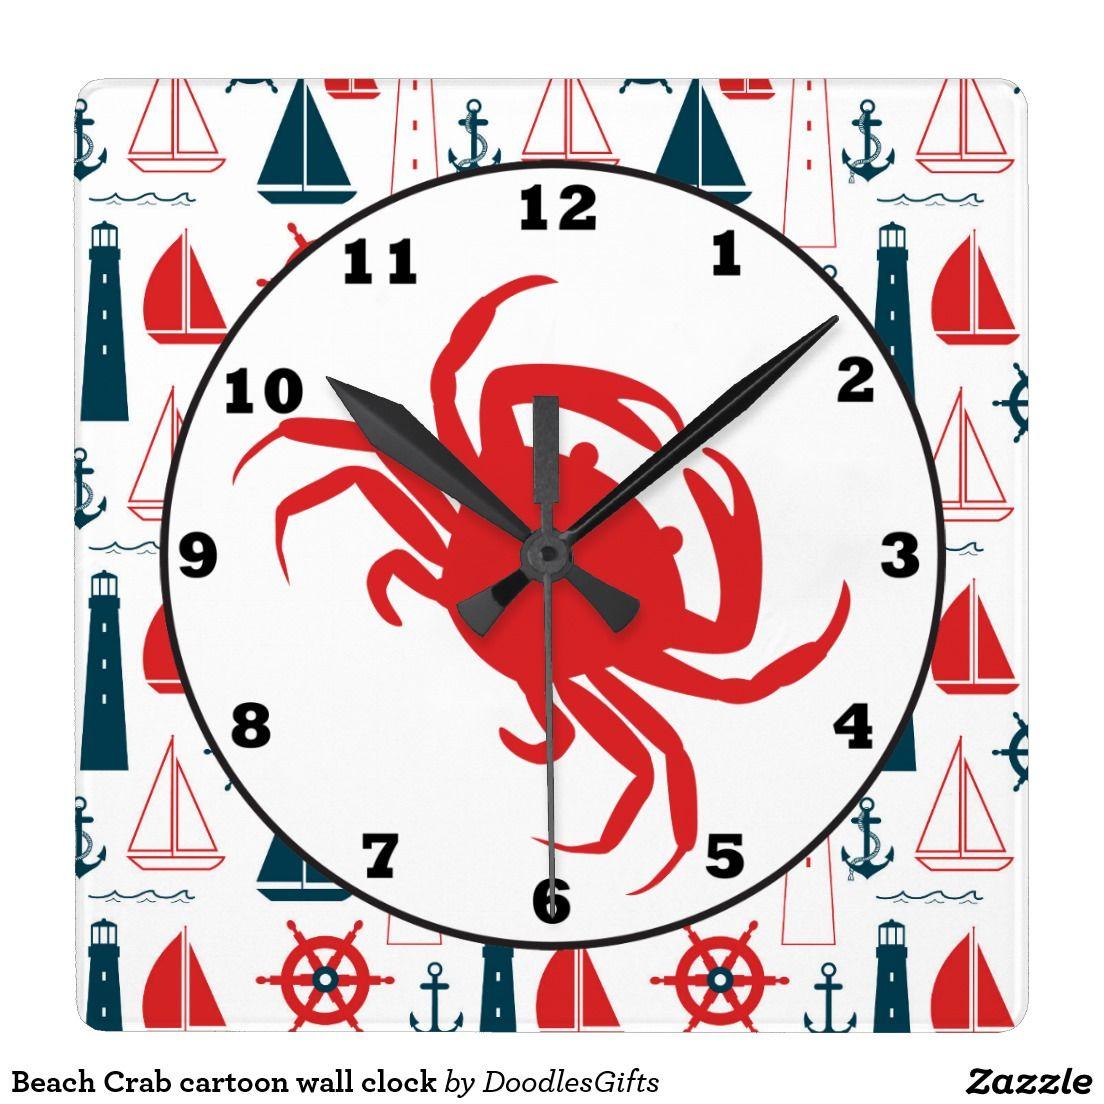 Cartoon wall clocks gallery home wall decoration ideas beach crab cartoon wall clock beach decor and gifts pinterest beach crab cartoon wall clock amipublicfo amipublicfo Gallery